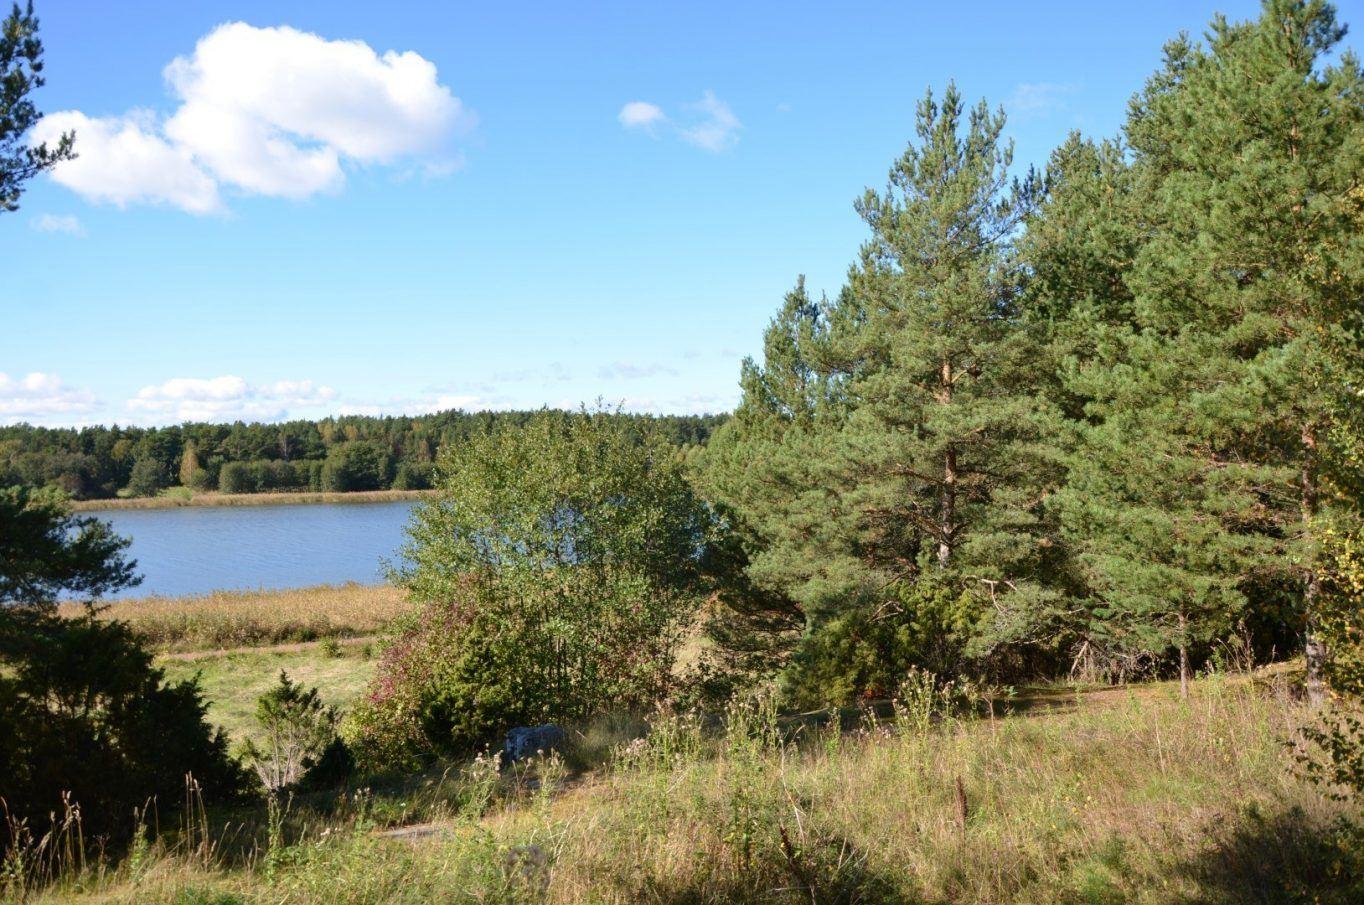 Radhustomt med naturskönt läge i Klemetsby, Lumparland.